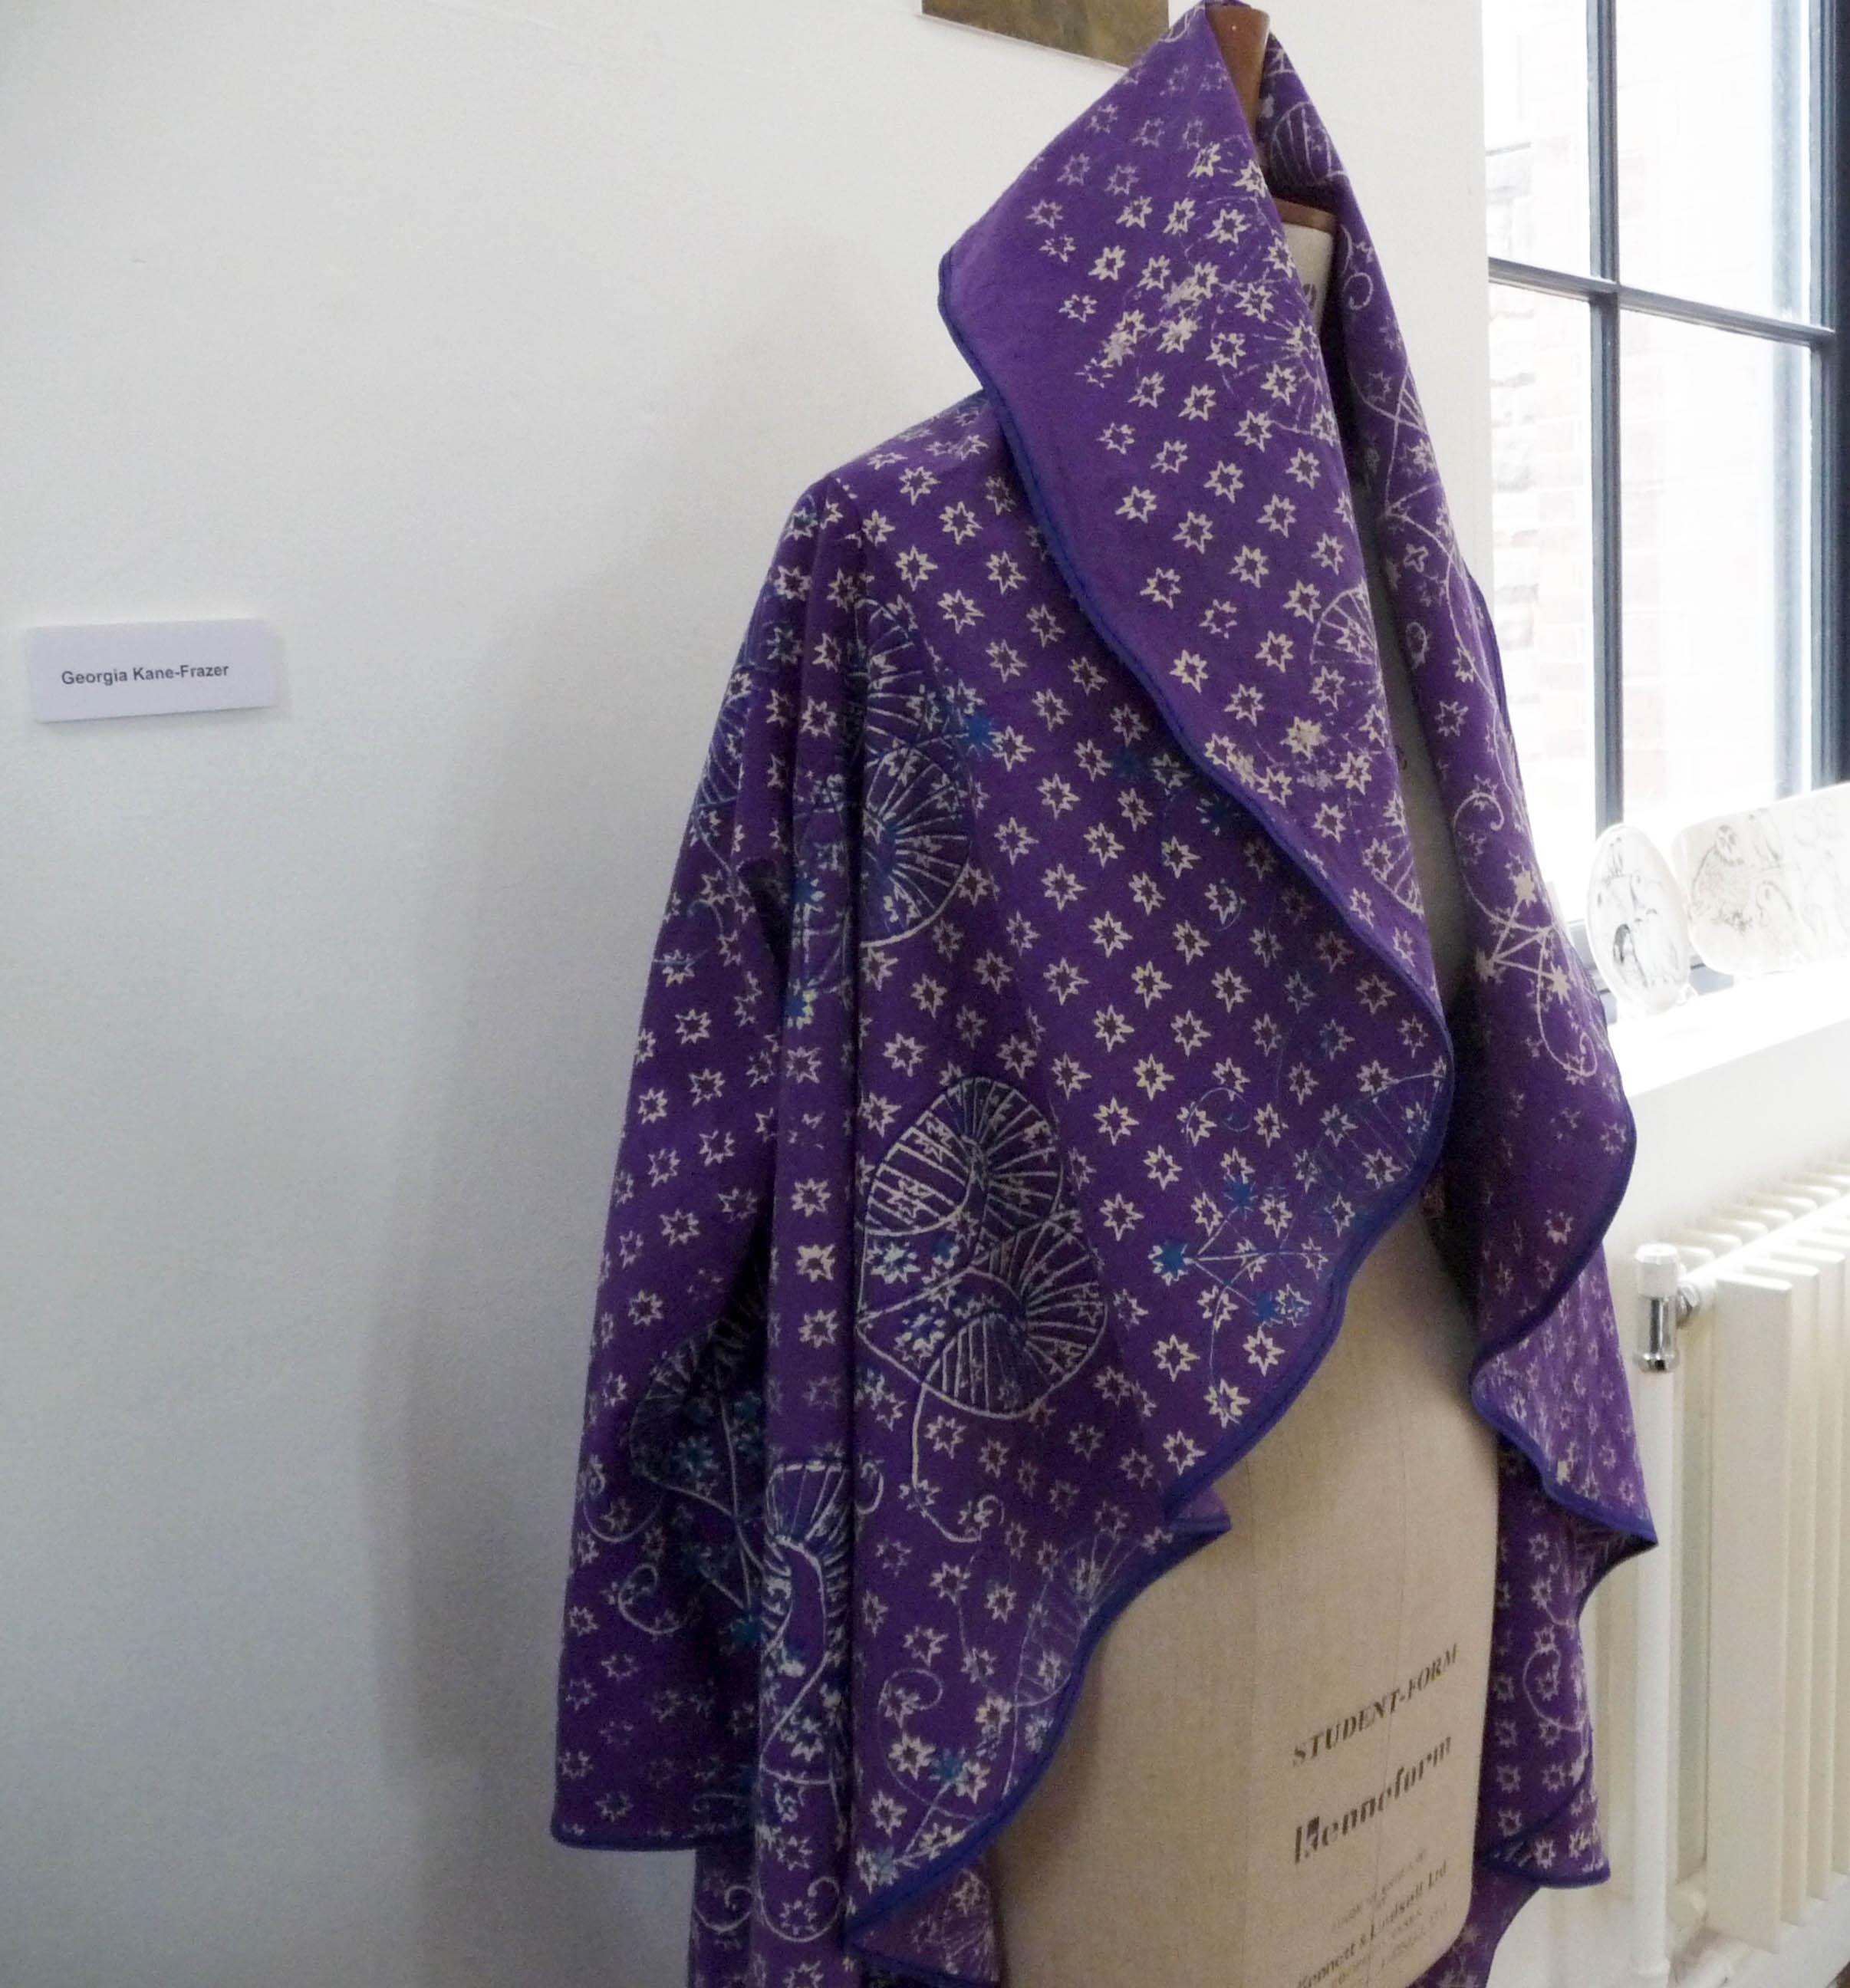 textiles by Georgia Kane Frazer, Liverpool Hope Univ Art Degree Show 2014